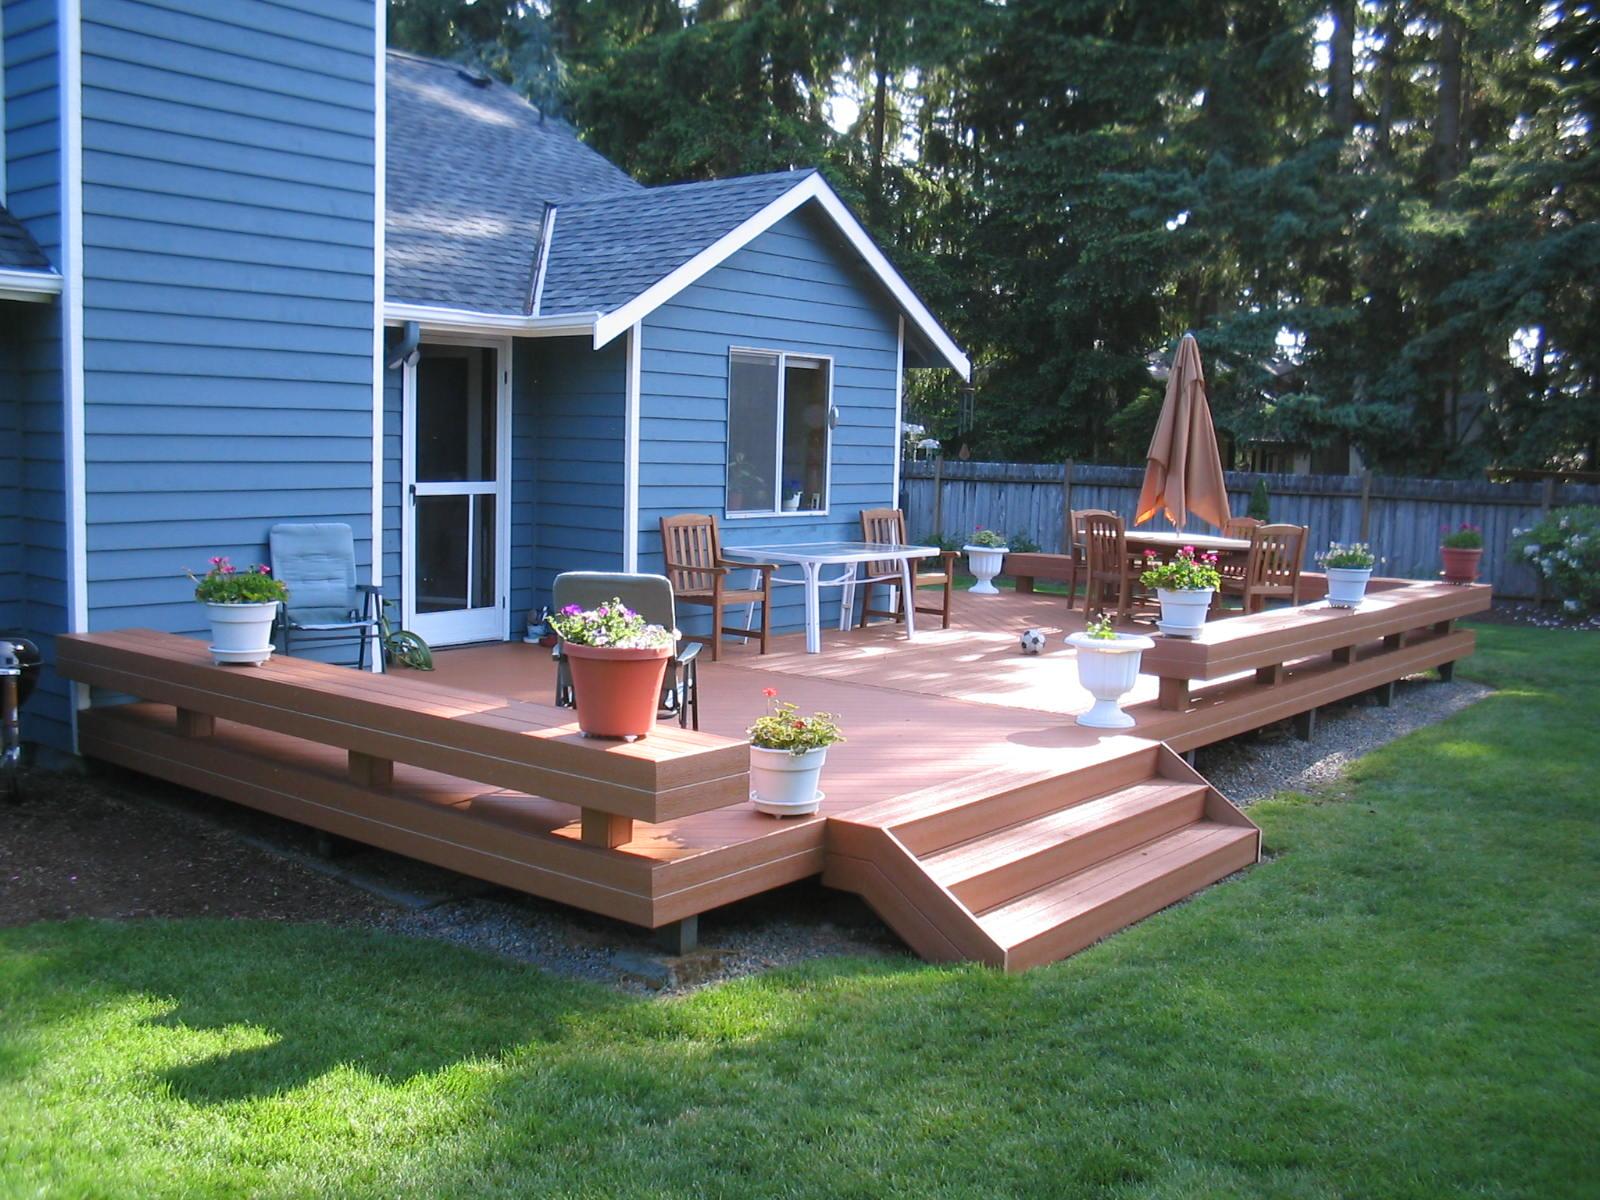 small deck design ideas | St. Louis decks, screened ... on Small Back Deck Decorating Ideas id=47316